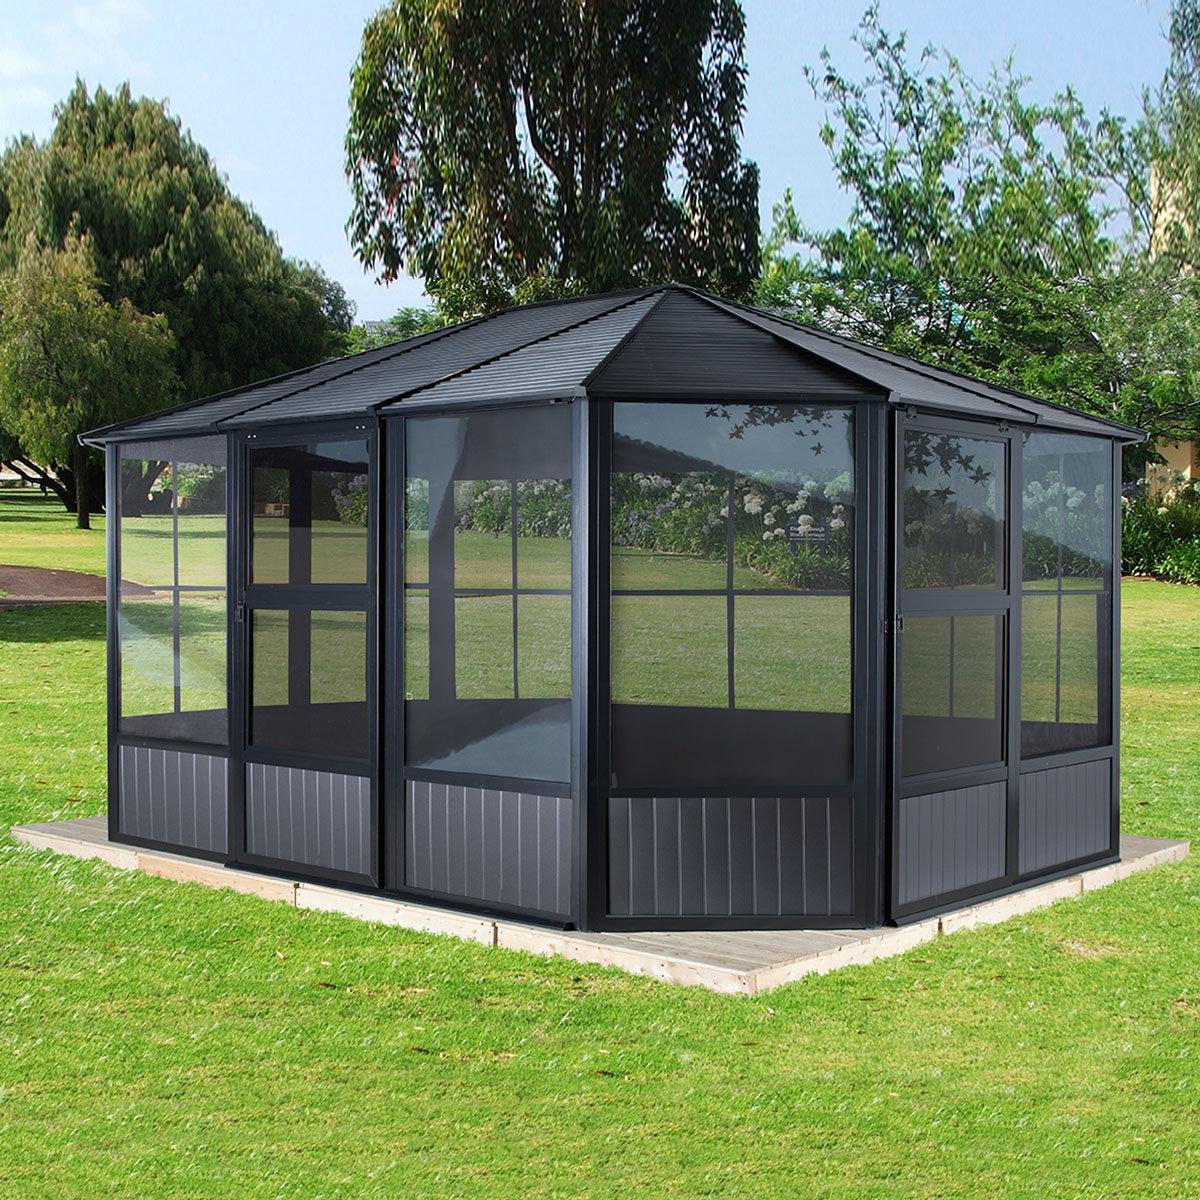 pavillon charleston 12x12 online kaufen bei g rtner p tschke. Black Bedroom Furniture Sets. Home Design Ideas